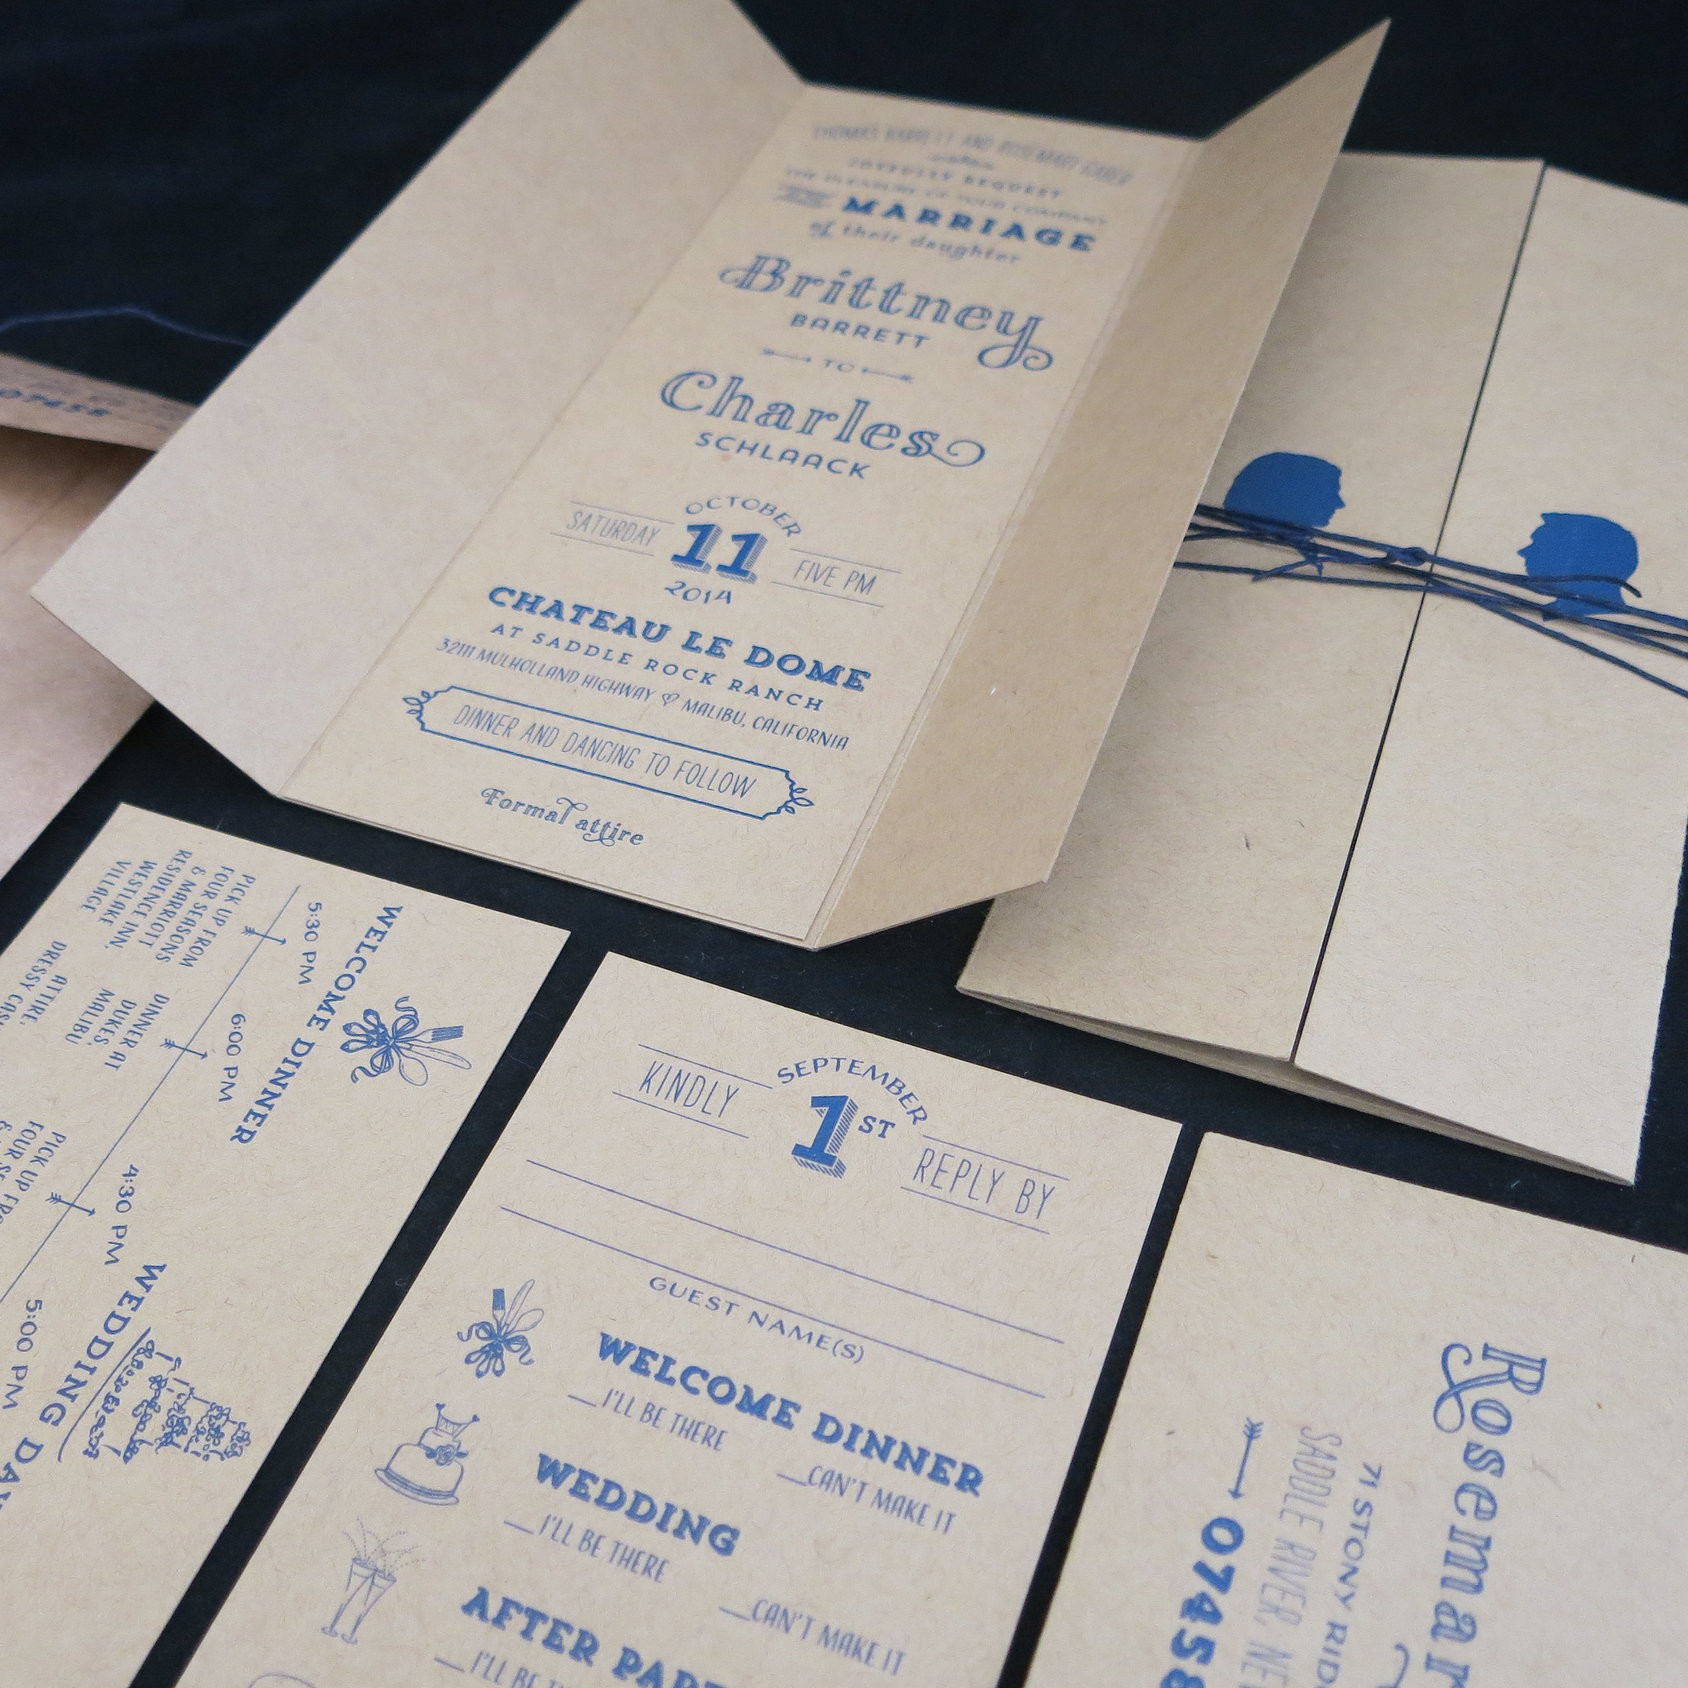 Halloween Wedding Invitations Uk Designs Free Printable Paper For - Free Printable Halloween Wedding Invitations